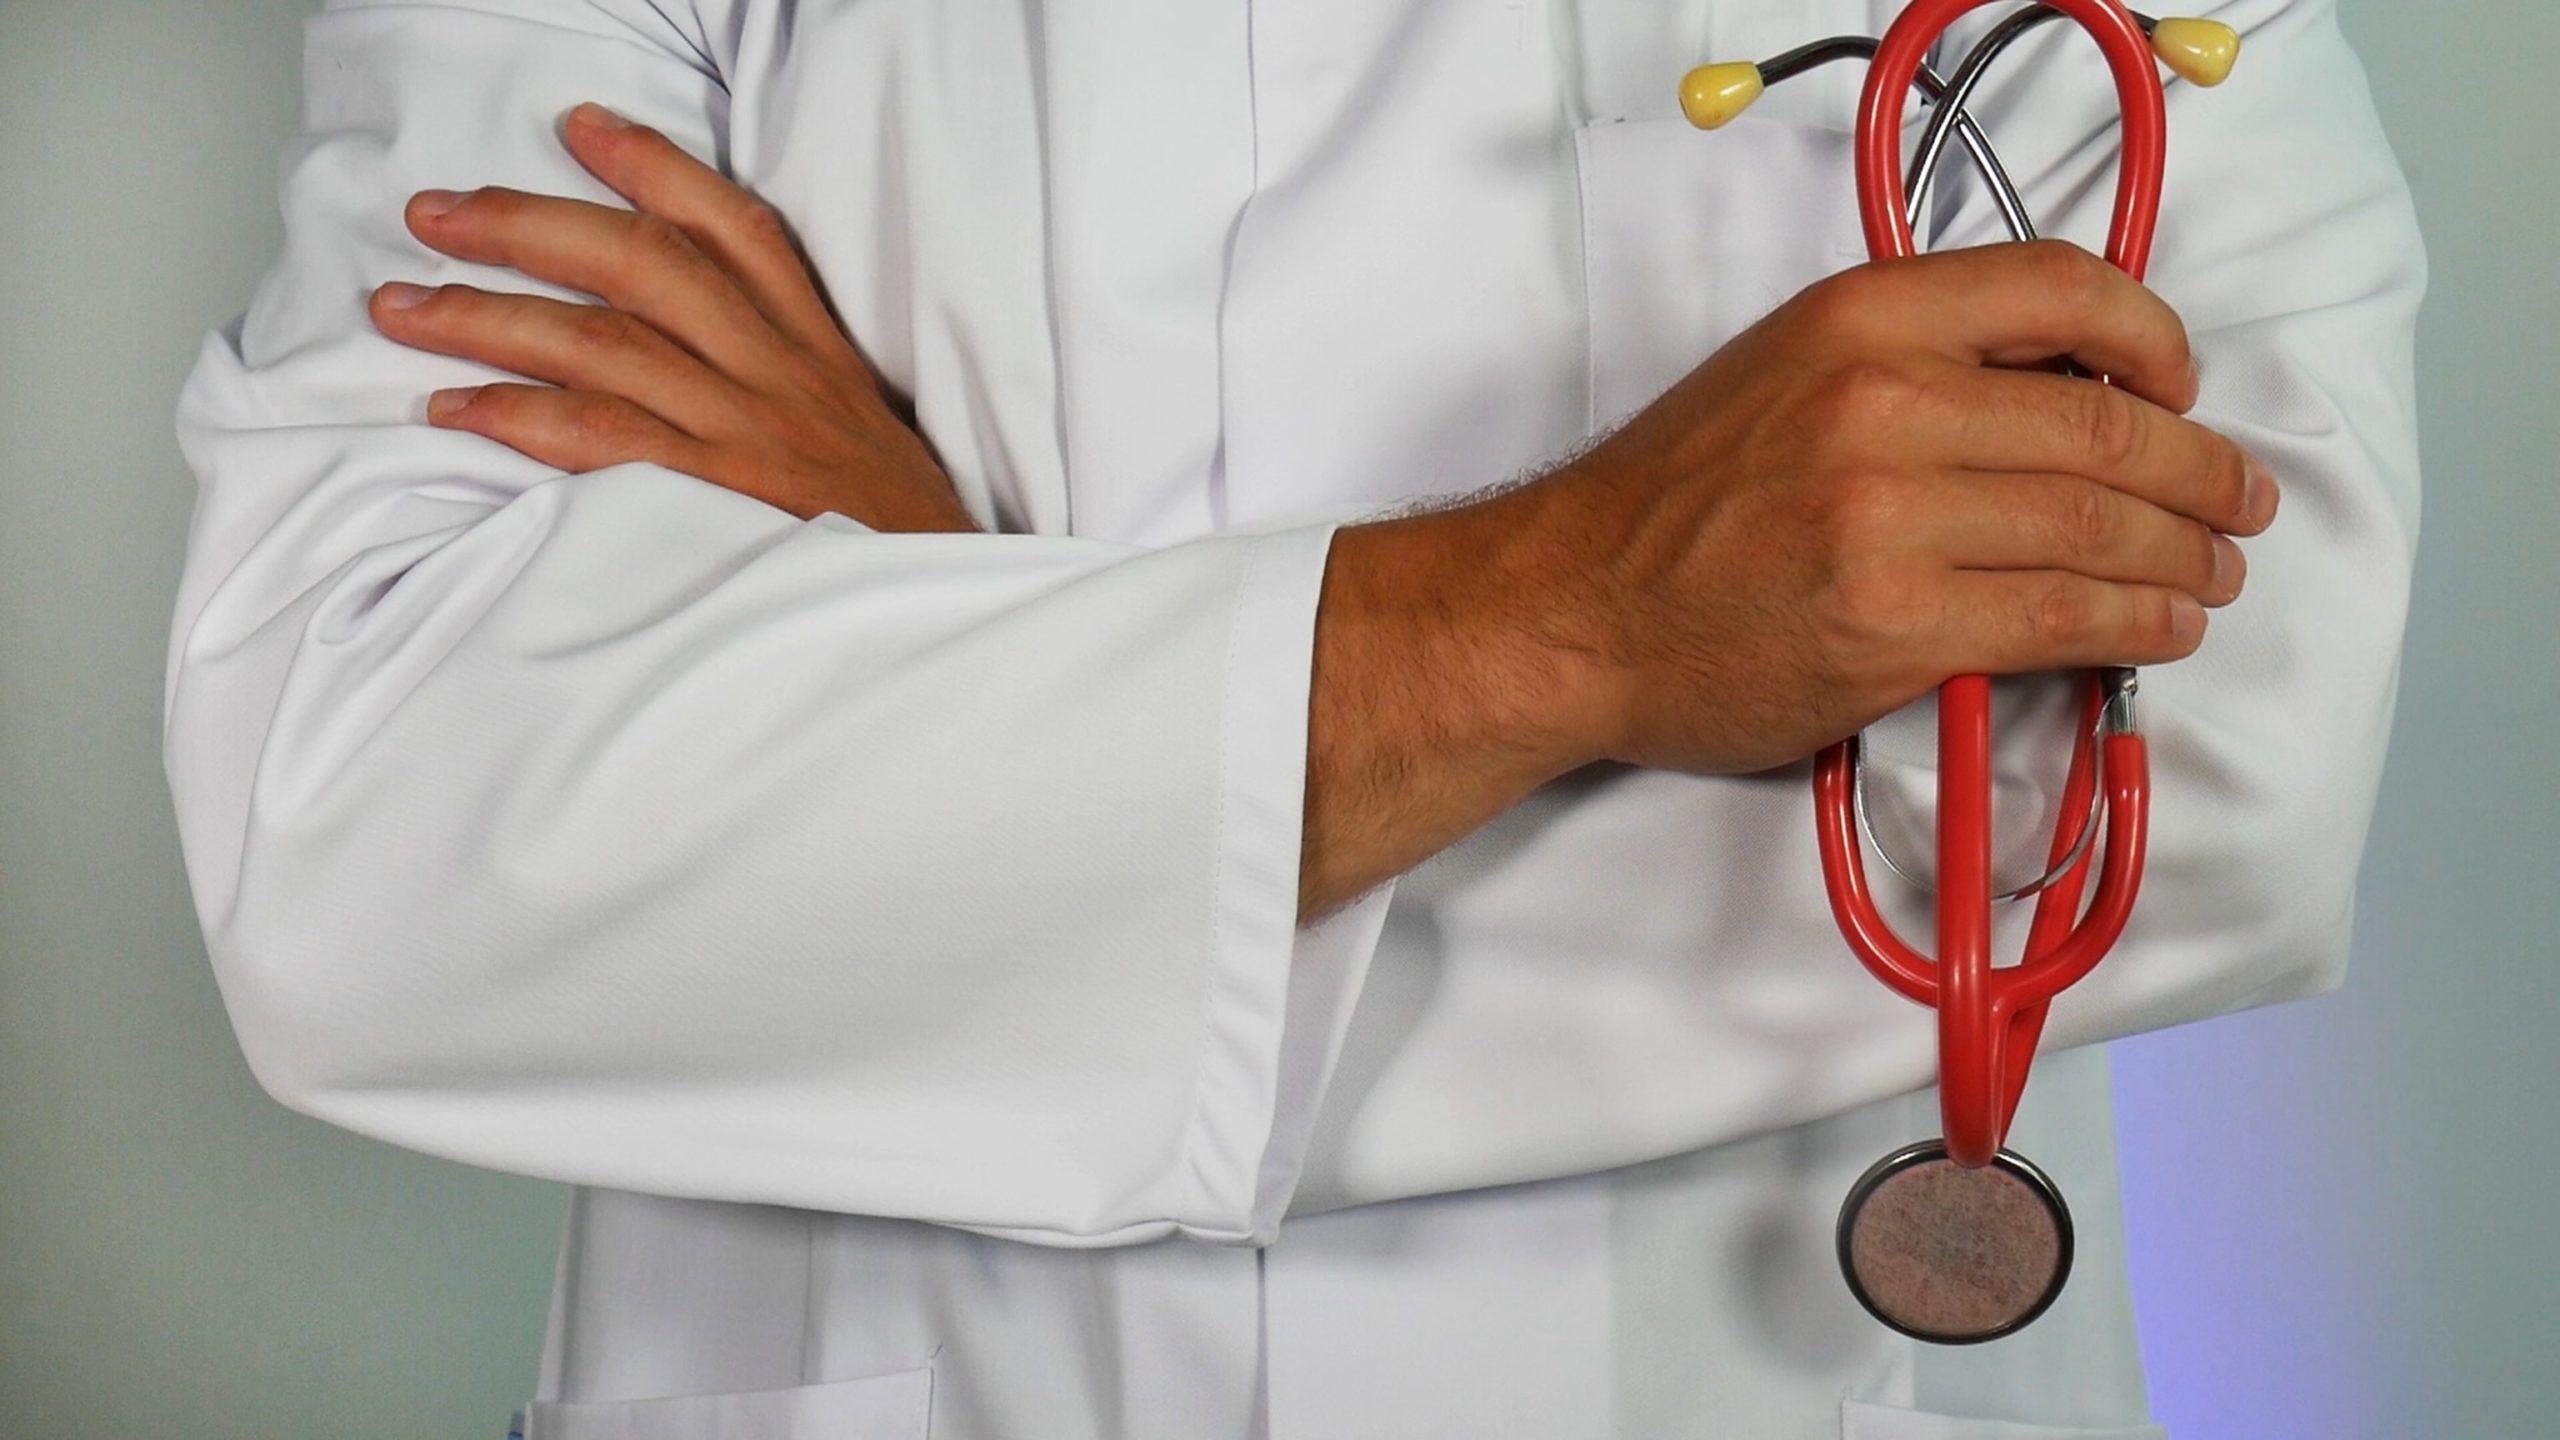 Correcting Your Medical Records In Washington State - Washington Law Center